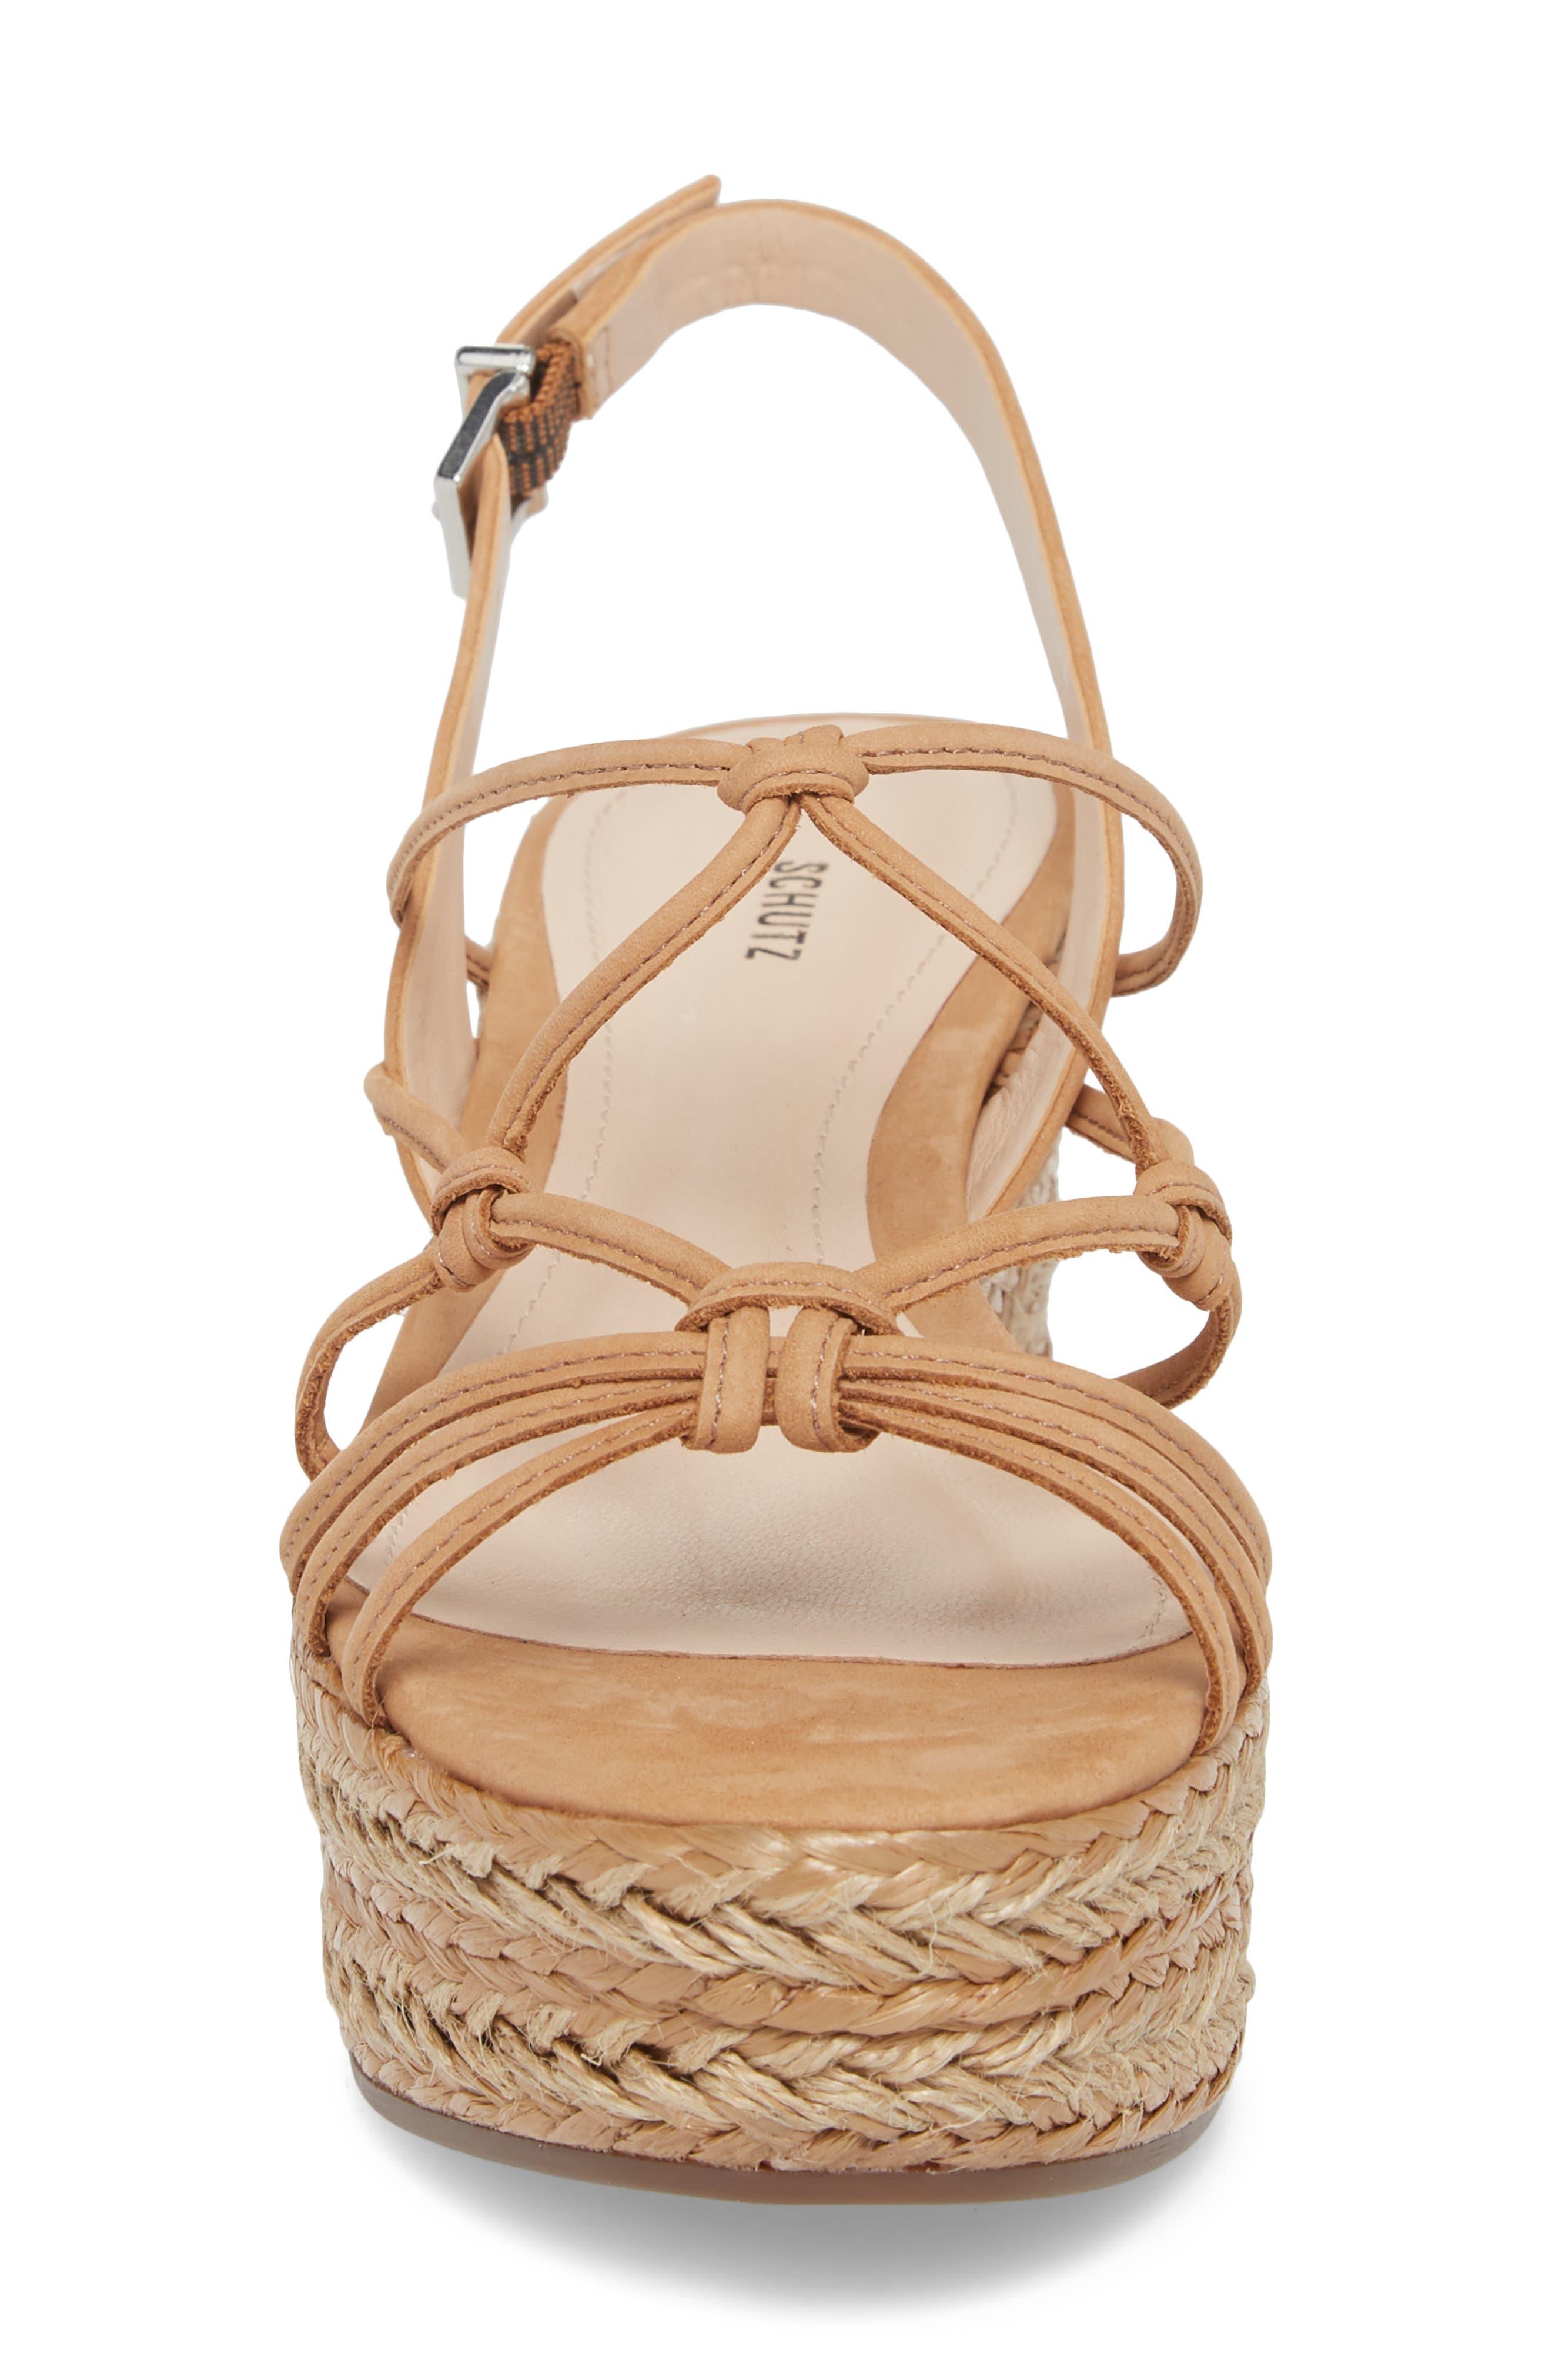 Latussa Platform Espadrille Sandal,                             Alternate thumbnail 4, color,                             Desert Leather